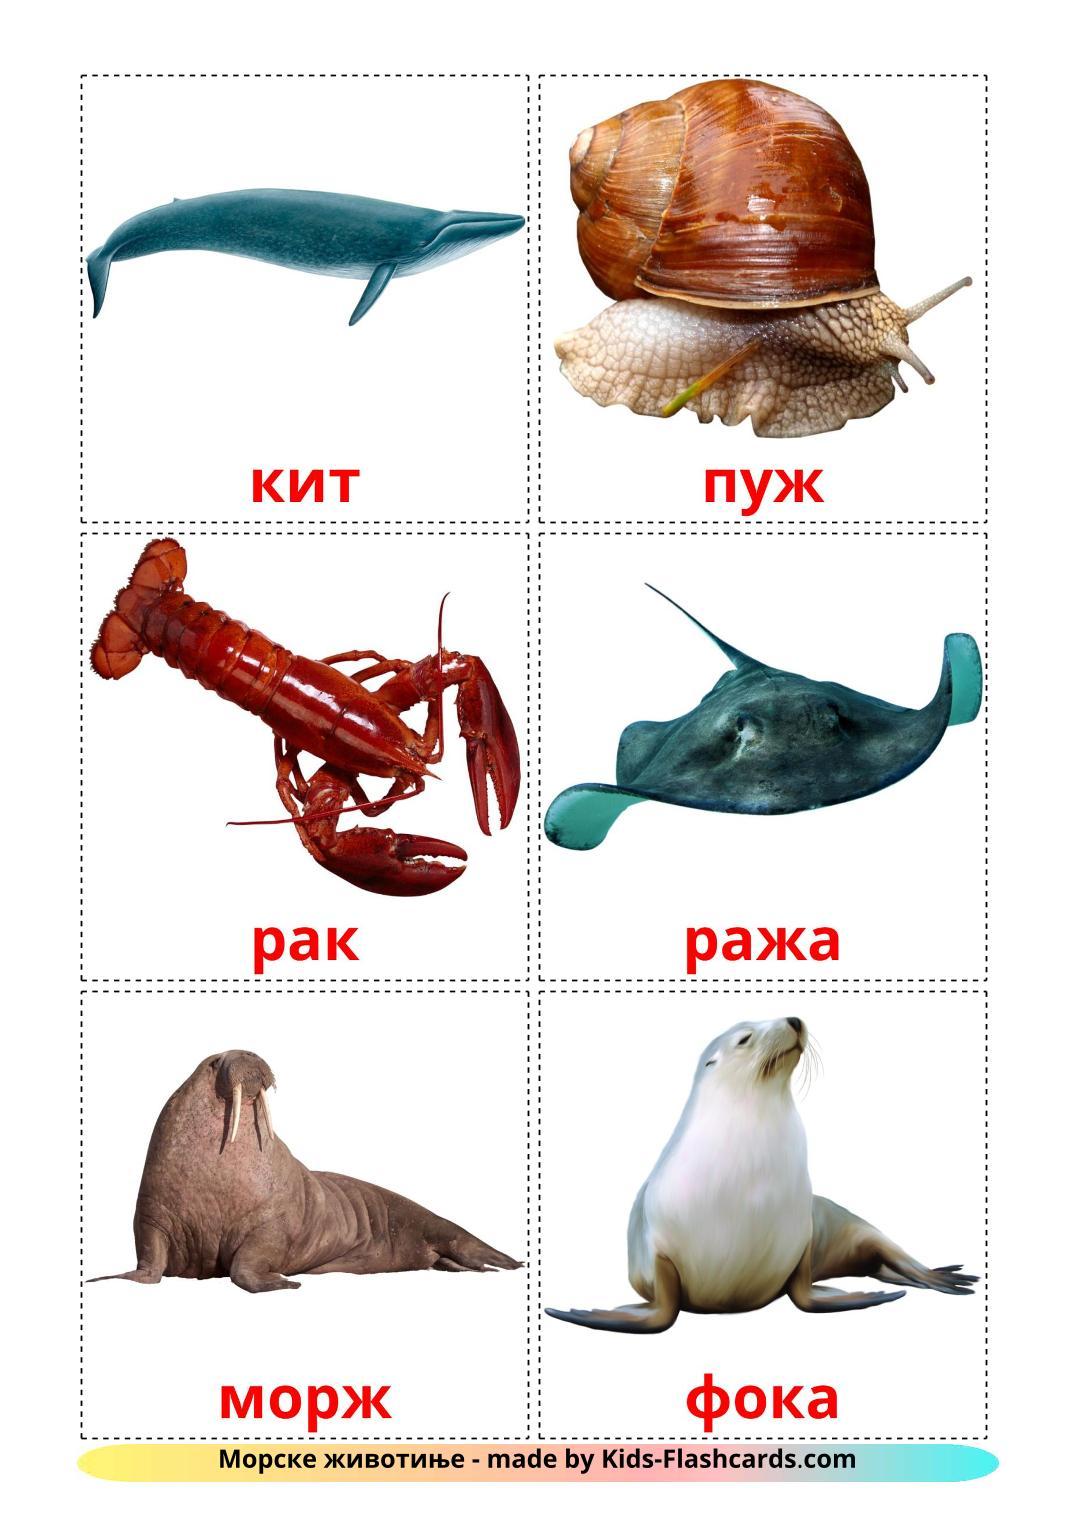 Sea animals - 29 Free Printable serbian(cyrillic) Flashcards